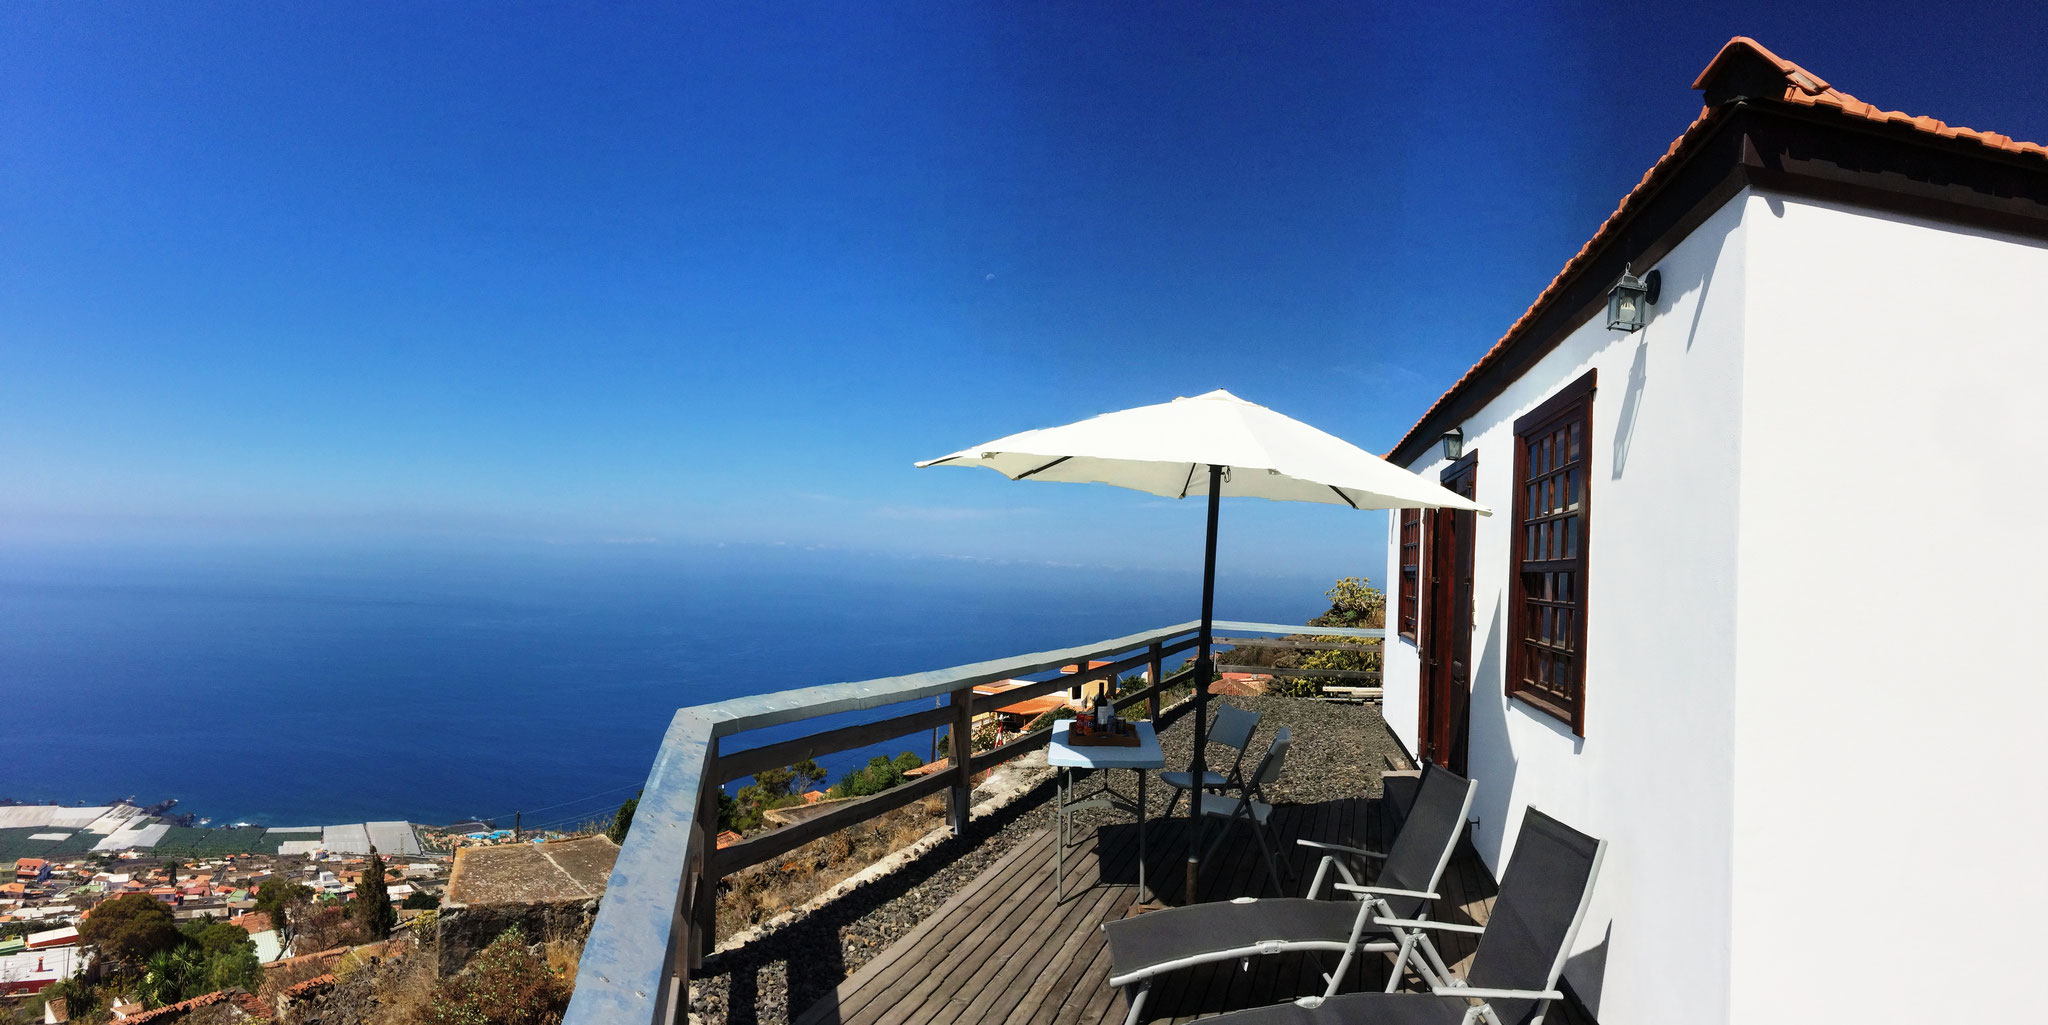 Casa Mirador - Terrassenaussicht - Las Indias - La Palma